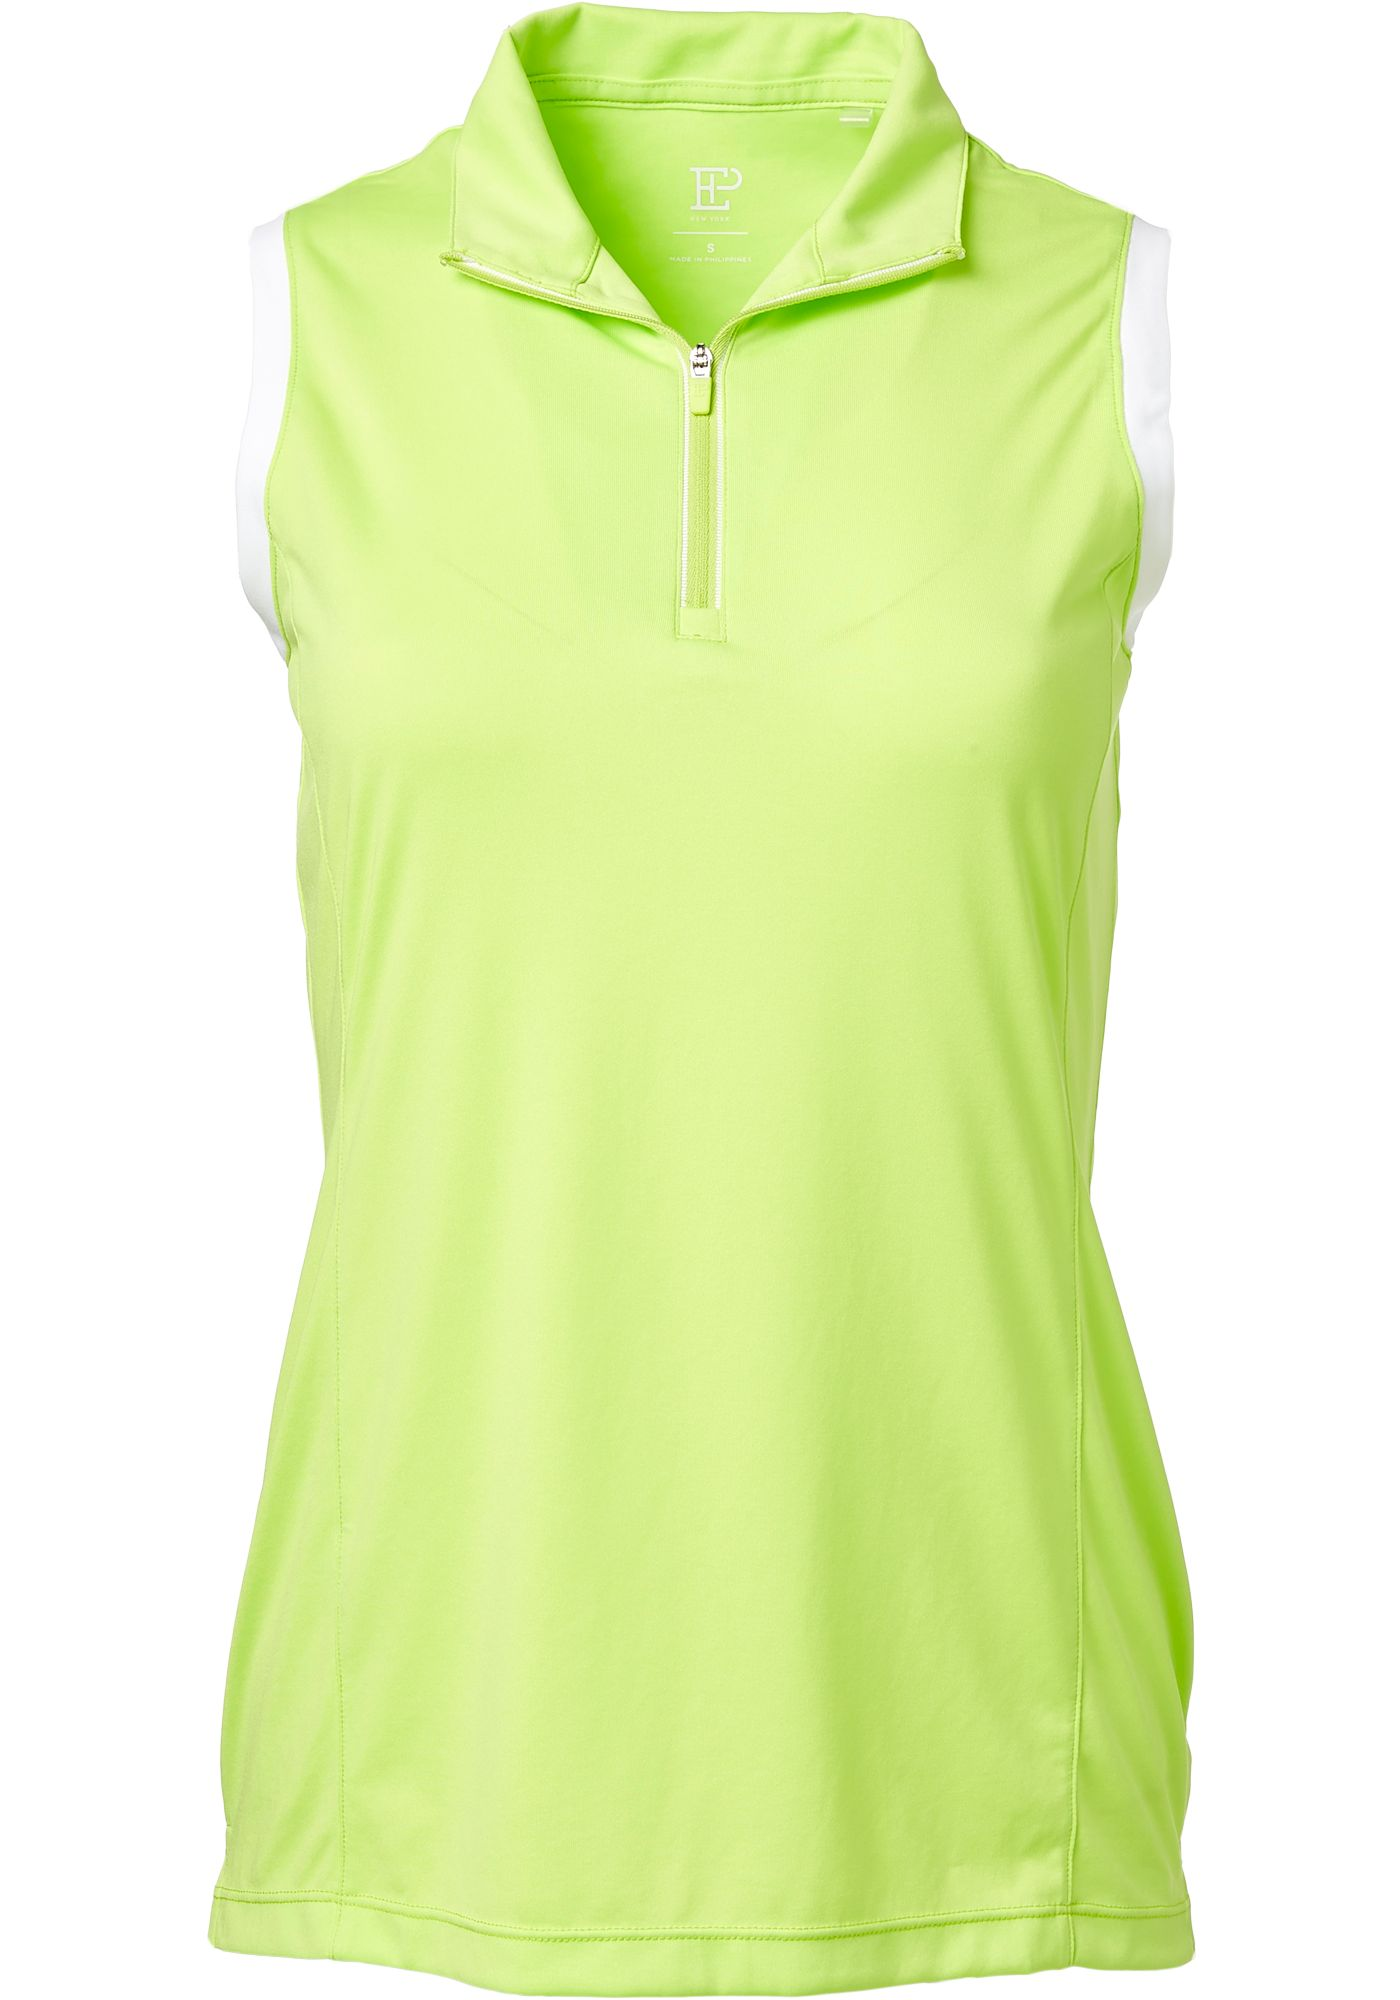 EP Pro Women's Sleeveless Convertible Zip Mock Golf Polo